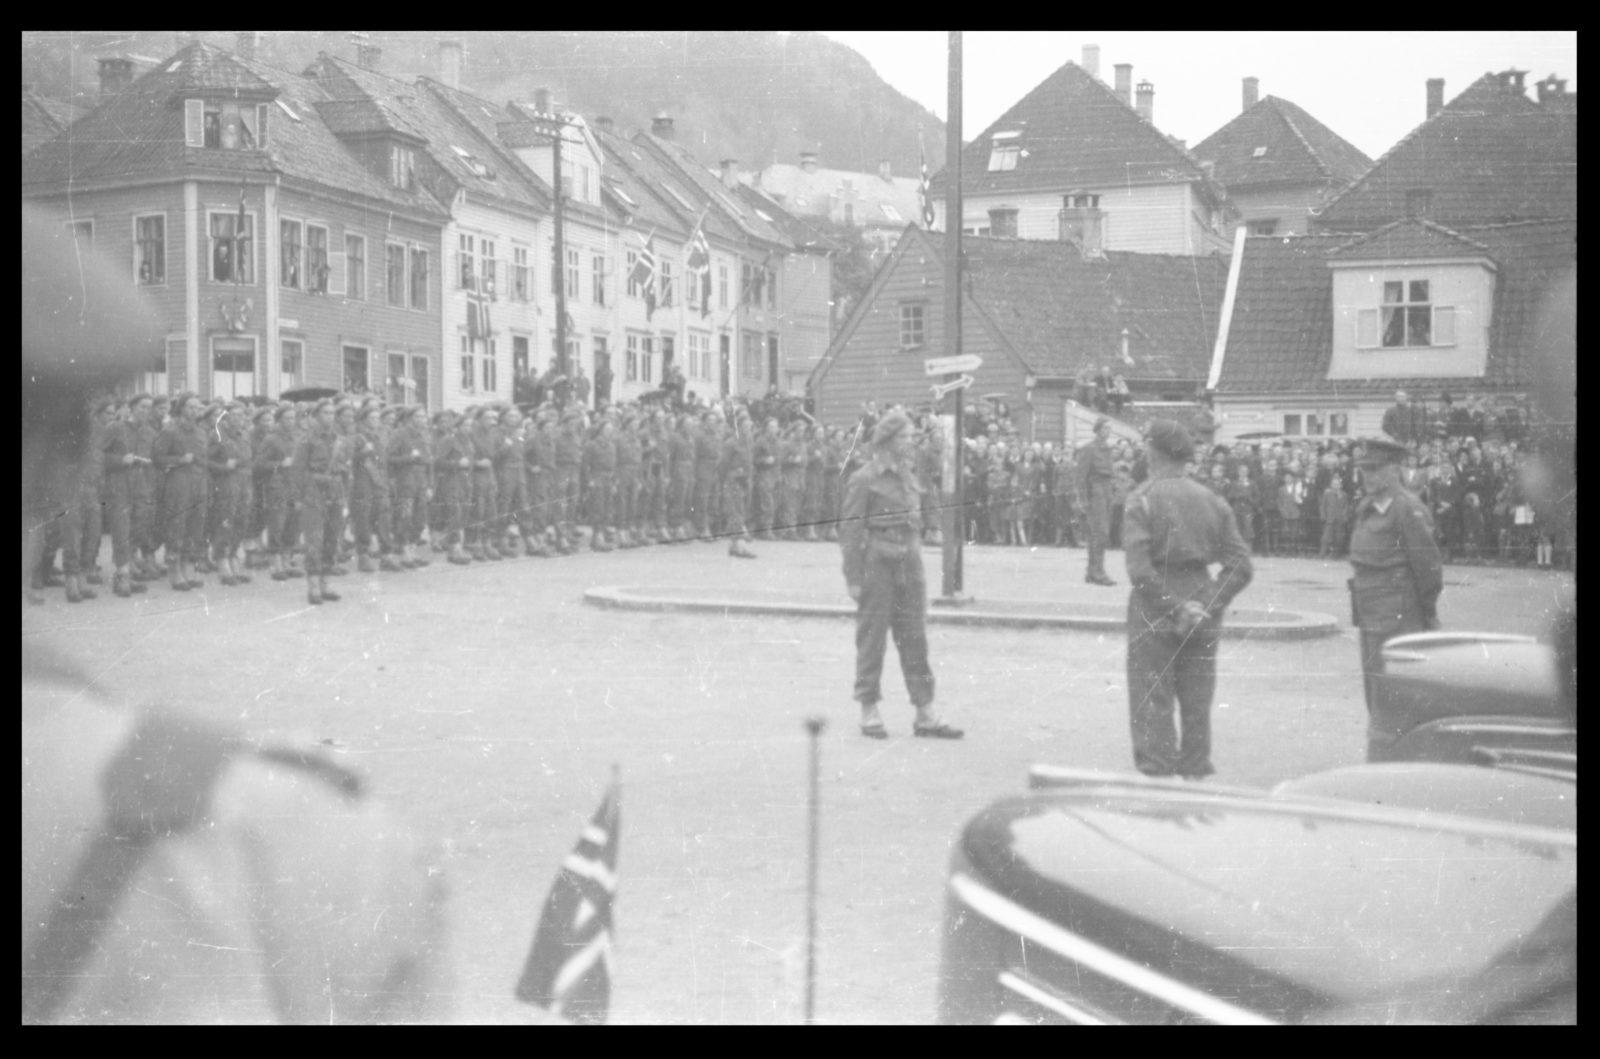 Colonel Trygve Sandvik returns to Bergen from England